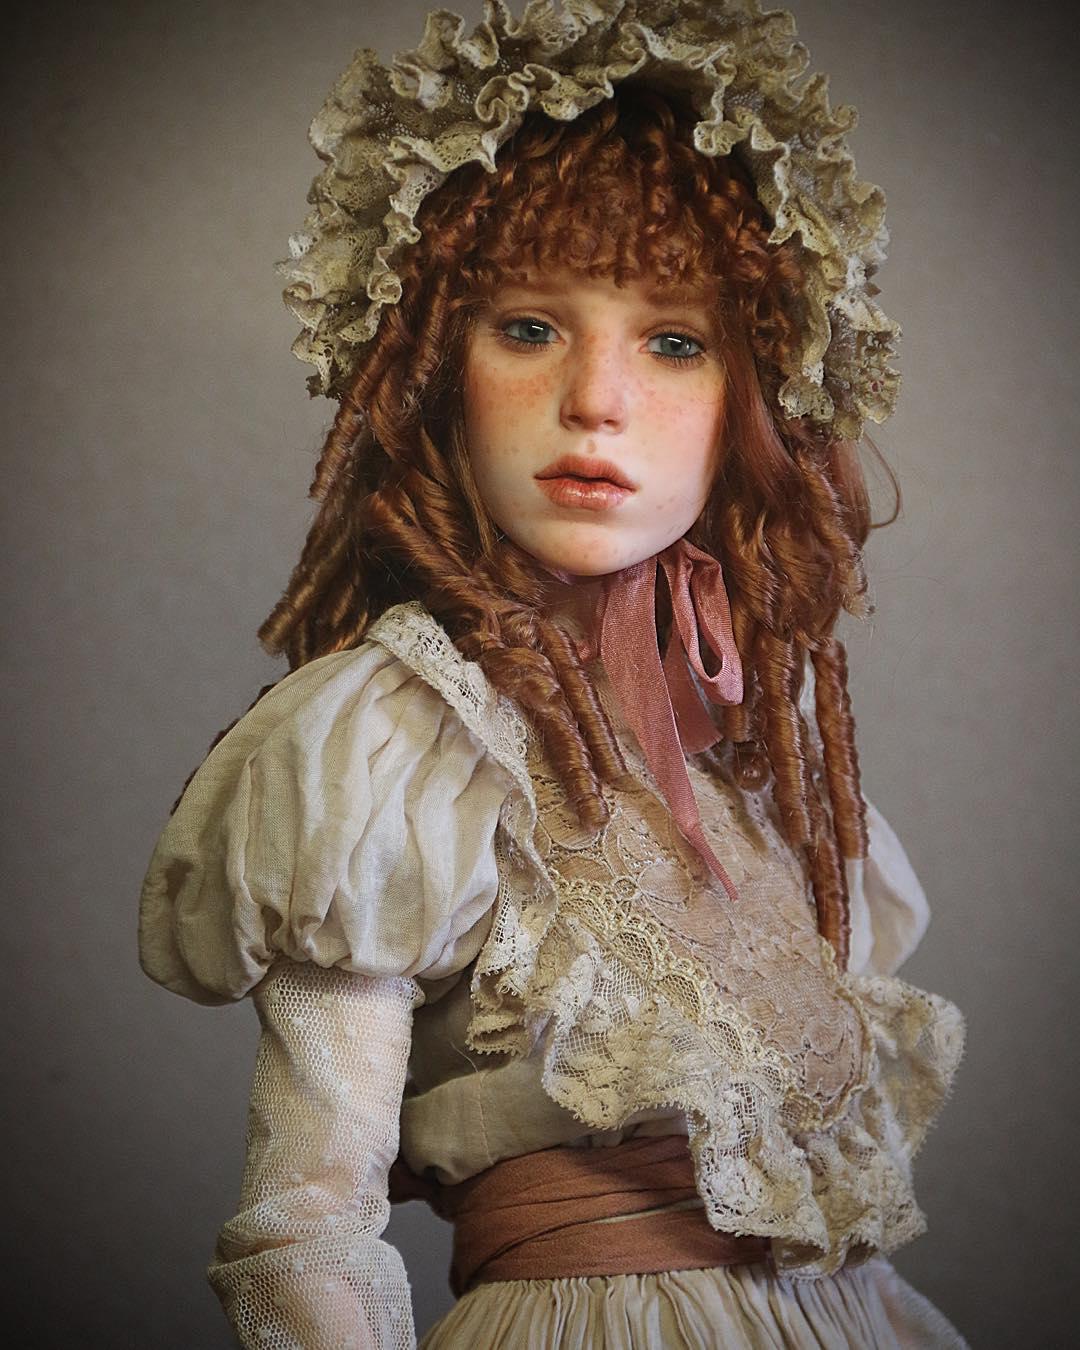 012216-Russian-Artist-Creates-Realistic-Doll-Faces-5